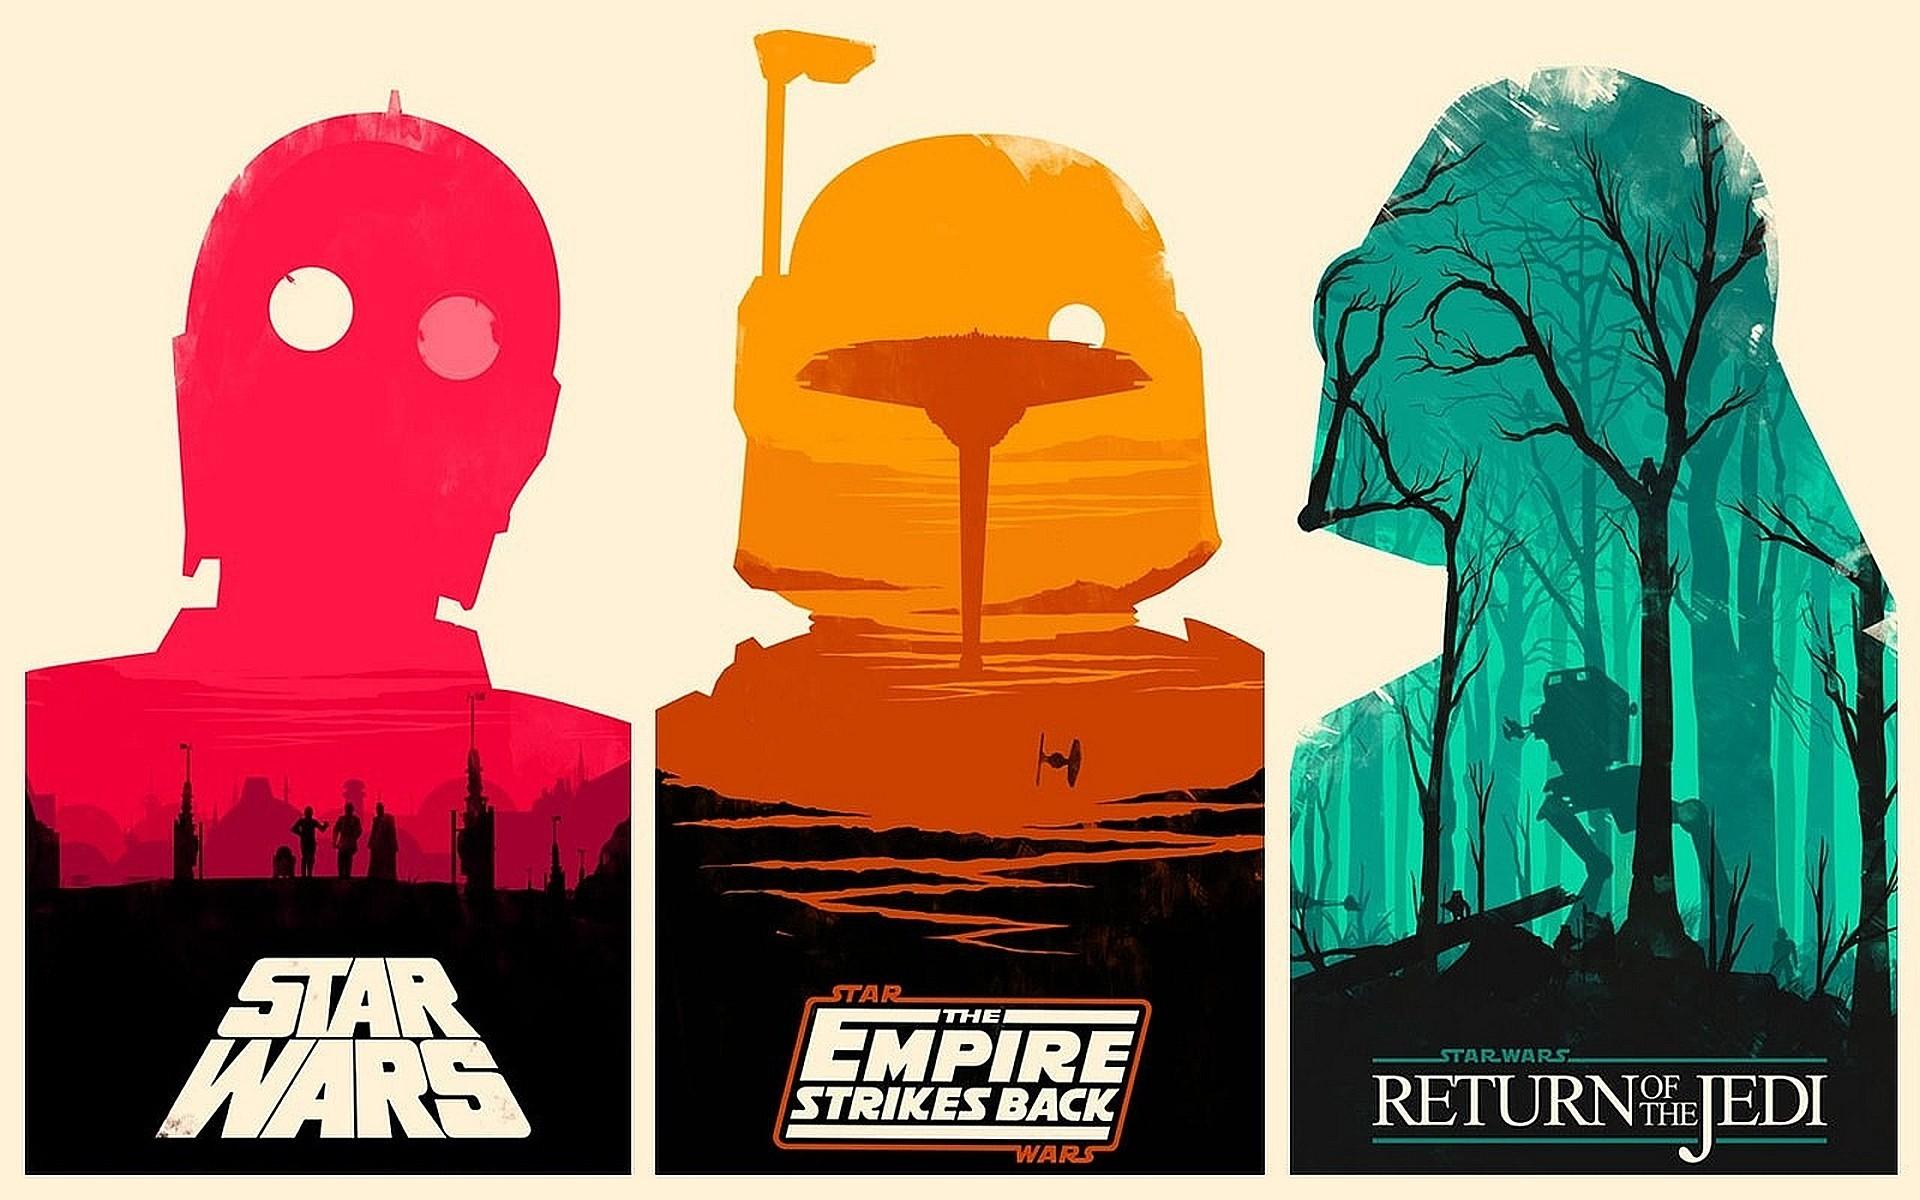 Boba Fett C-3PO Darth Vader Movies Return Of The Jedi Star Wars Empire  Strikes Back